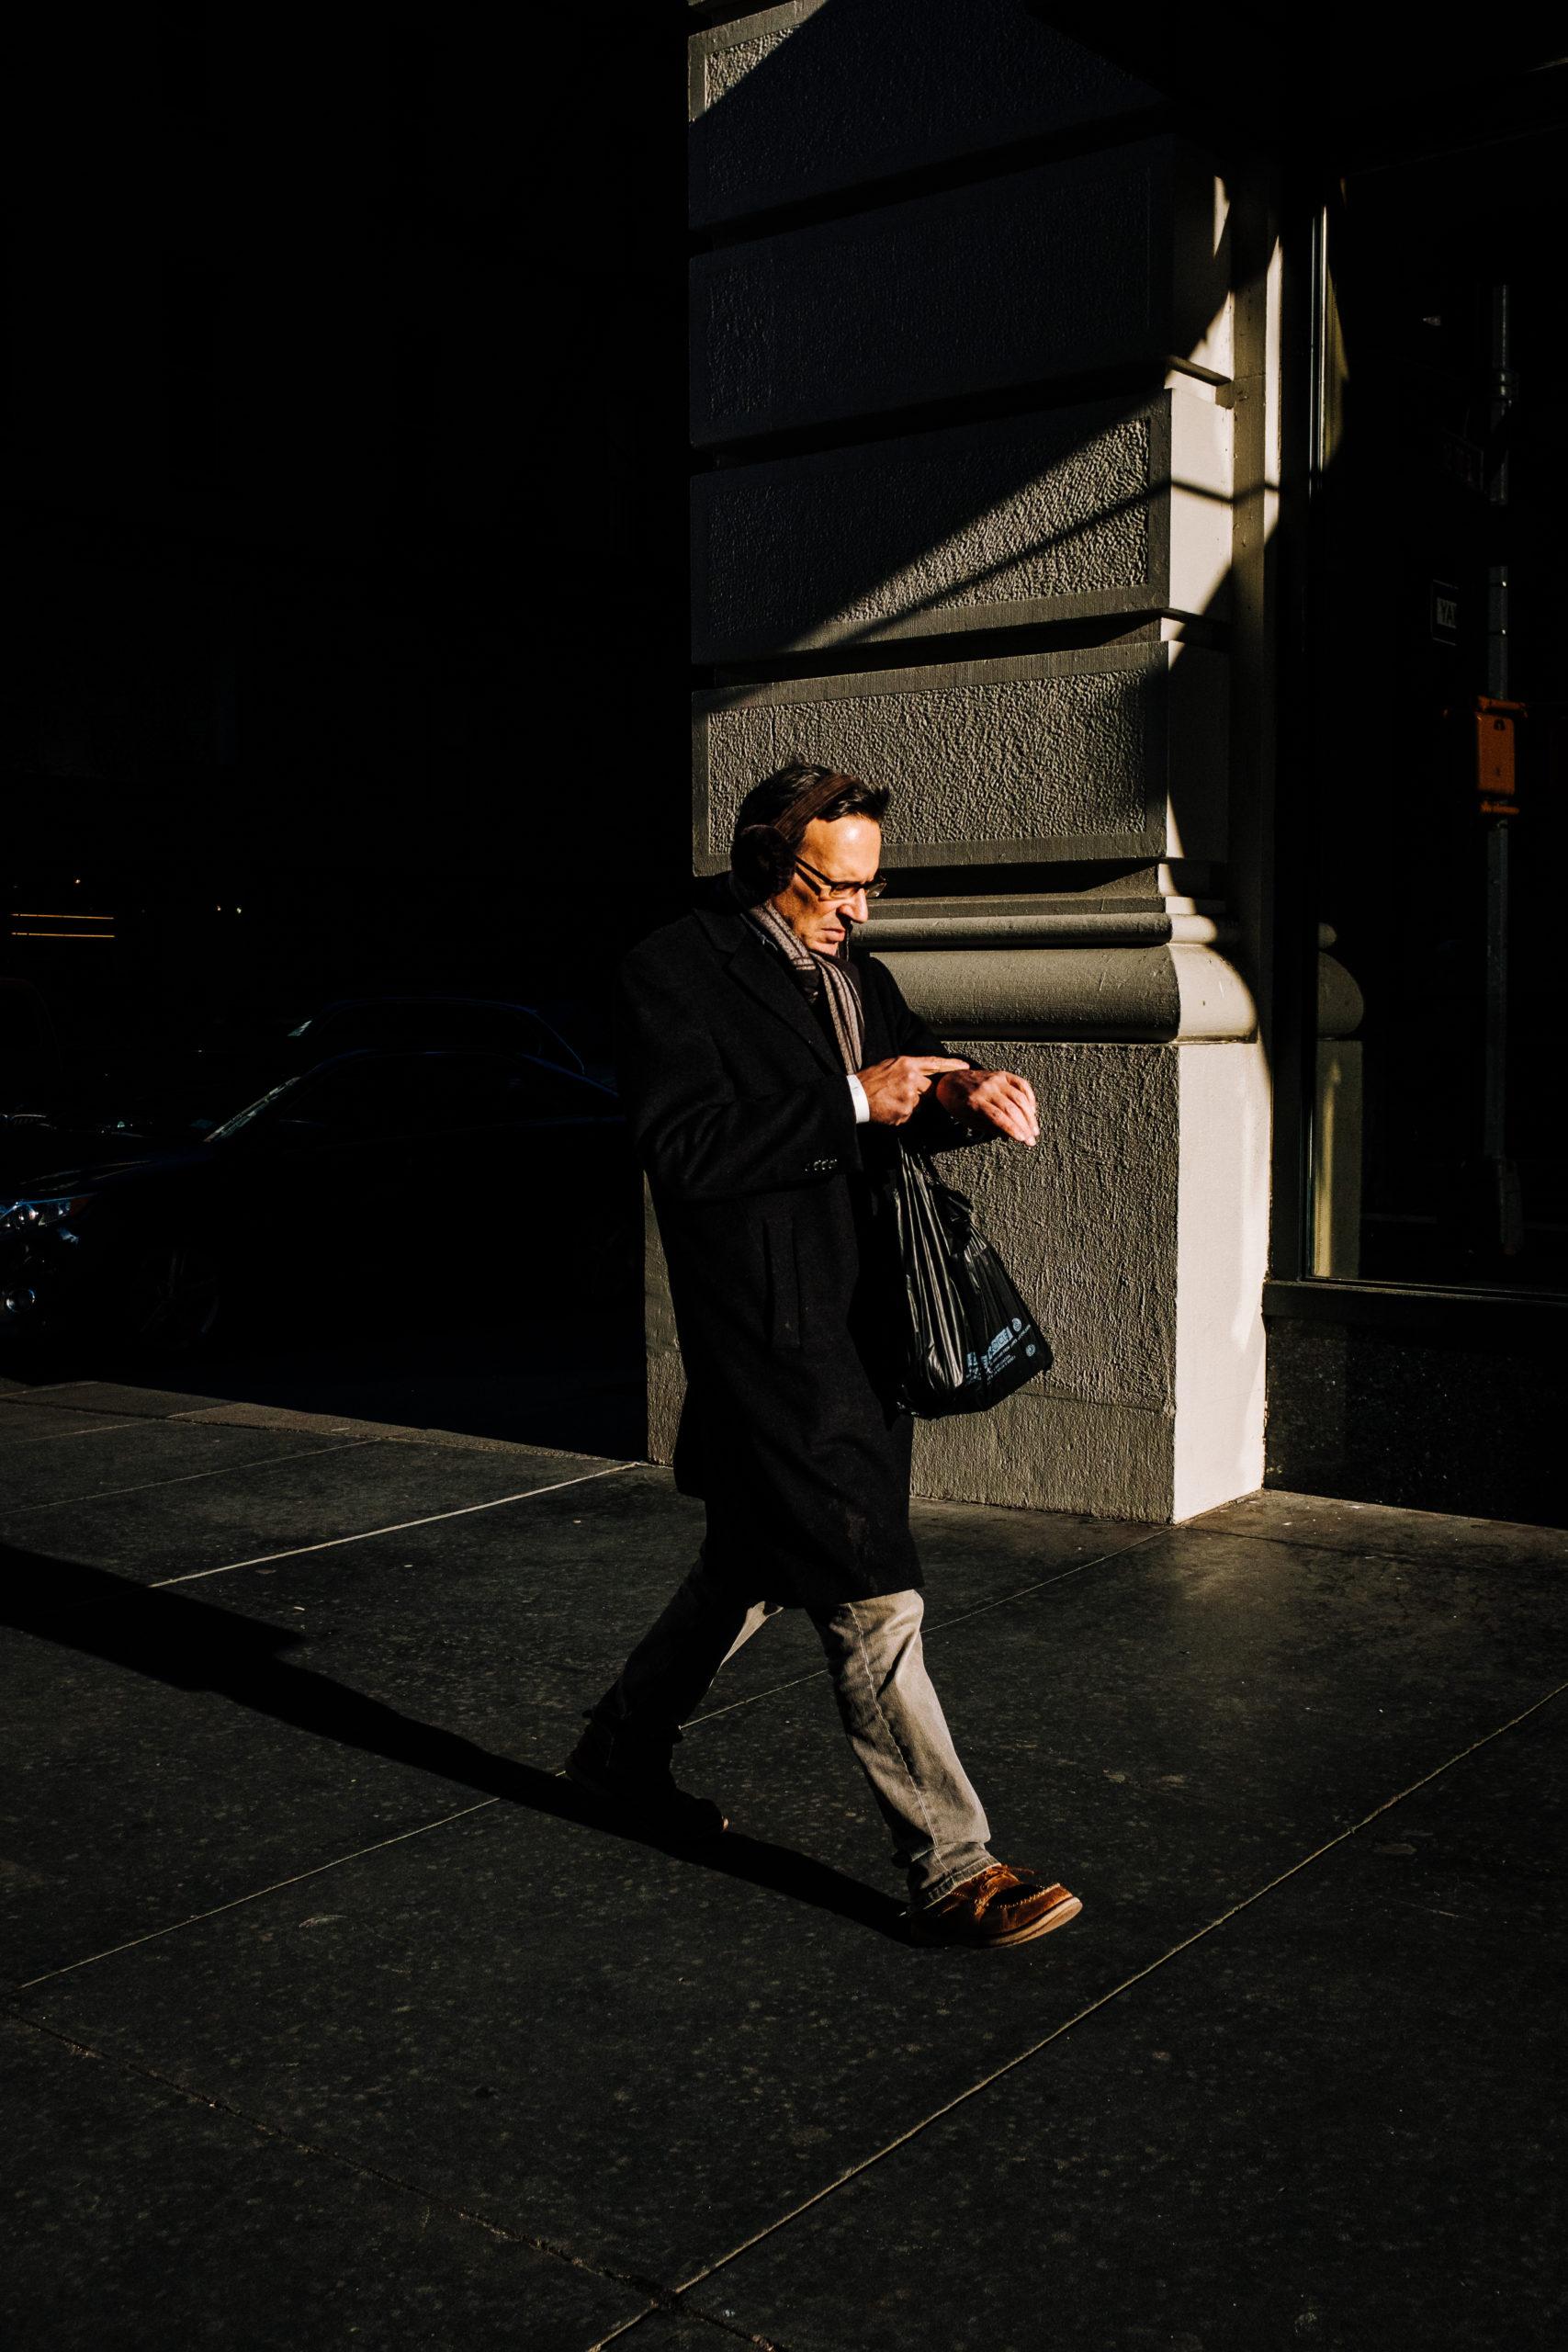 busy man walking